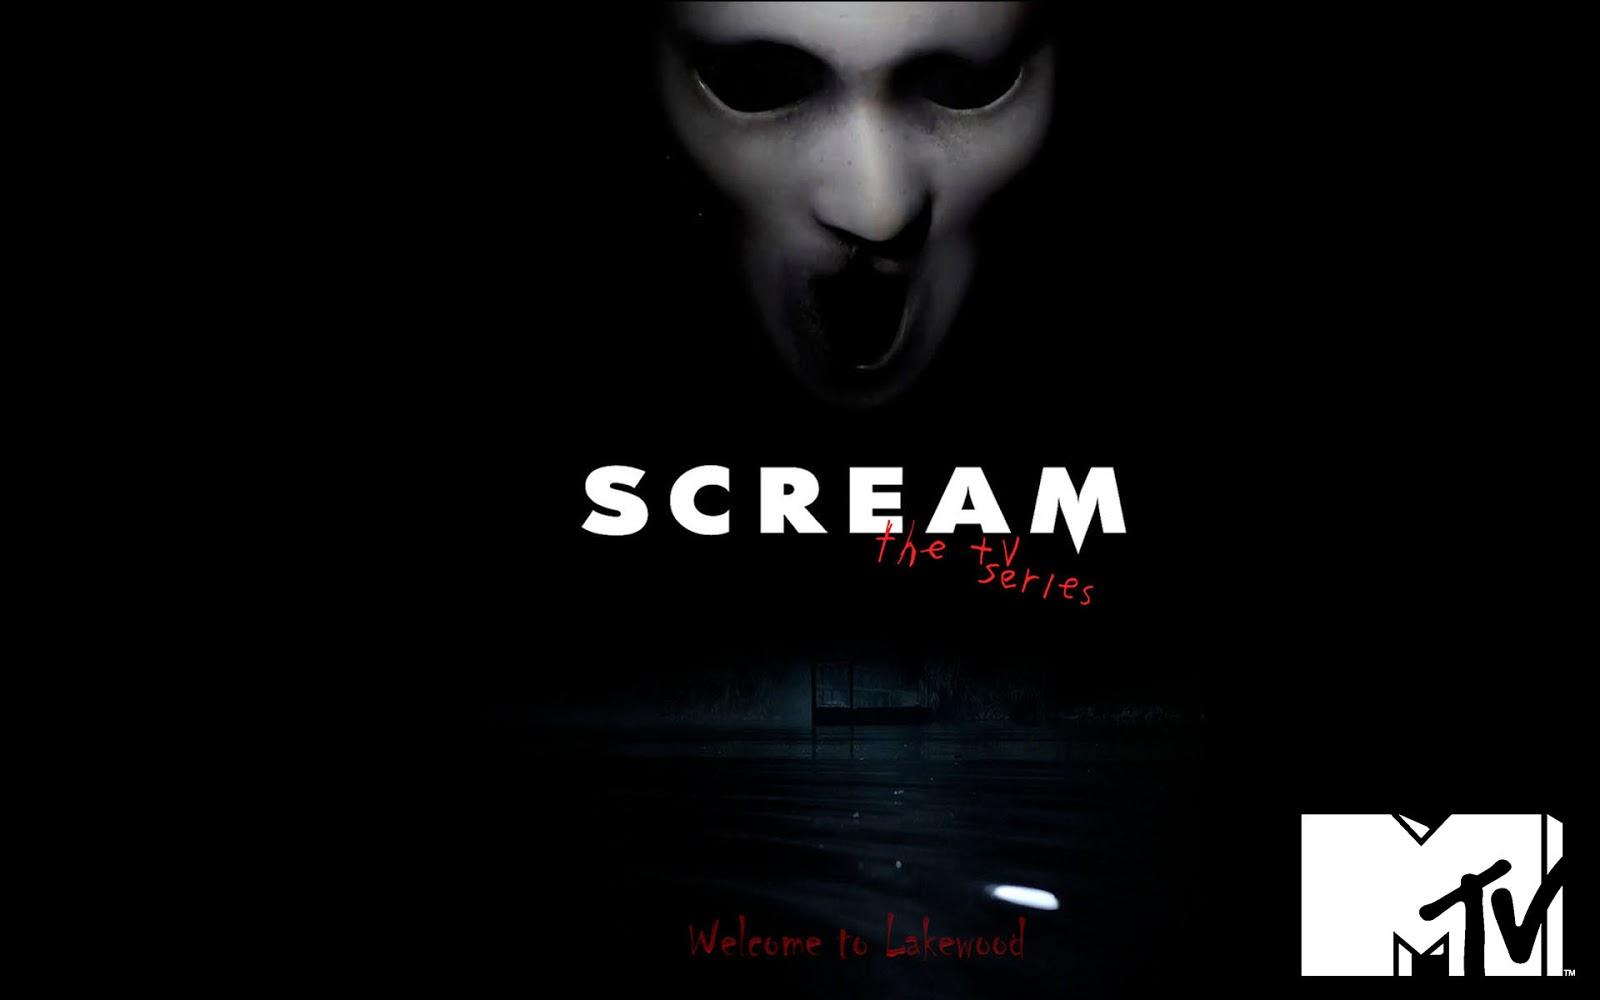 Scream Staffel 1